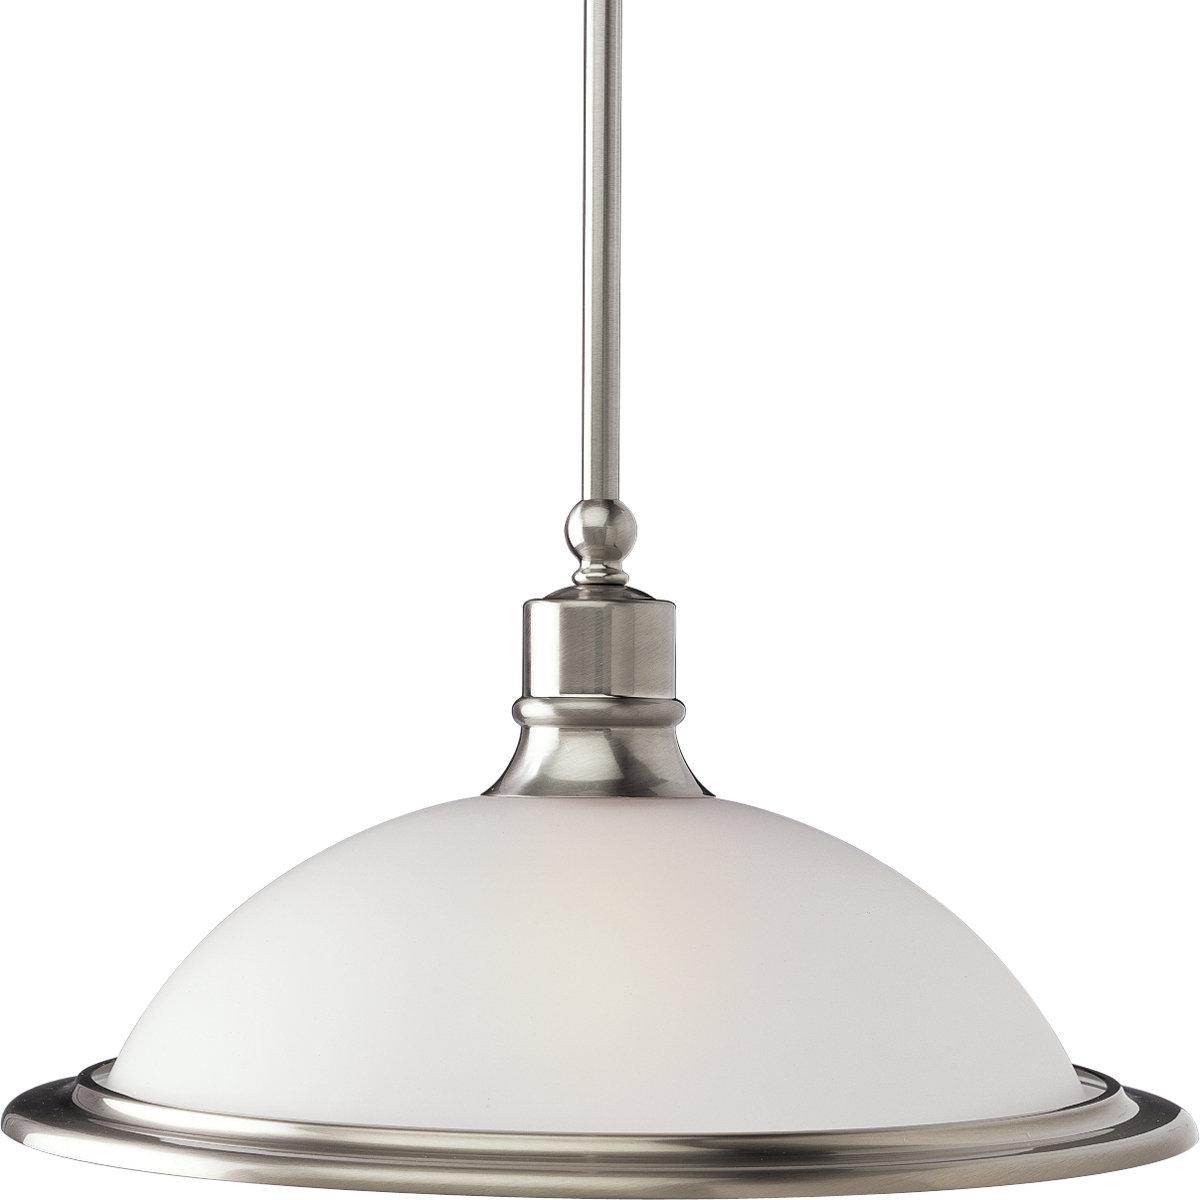 Famous Vangorder 1 Light Dome Pendant In Abernathy 1 Light Dome Pendants (View 3 of 25)